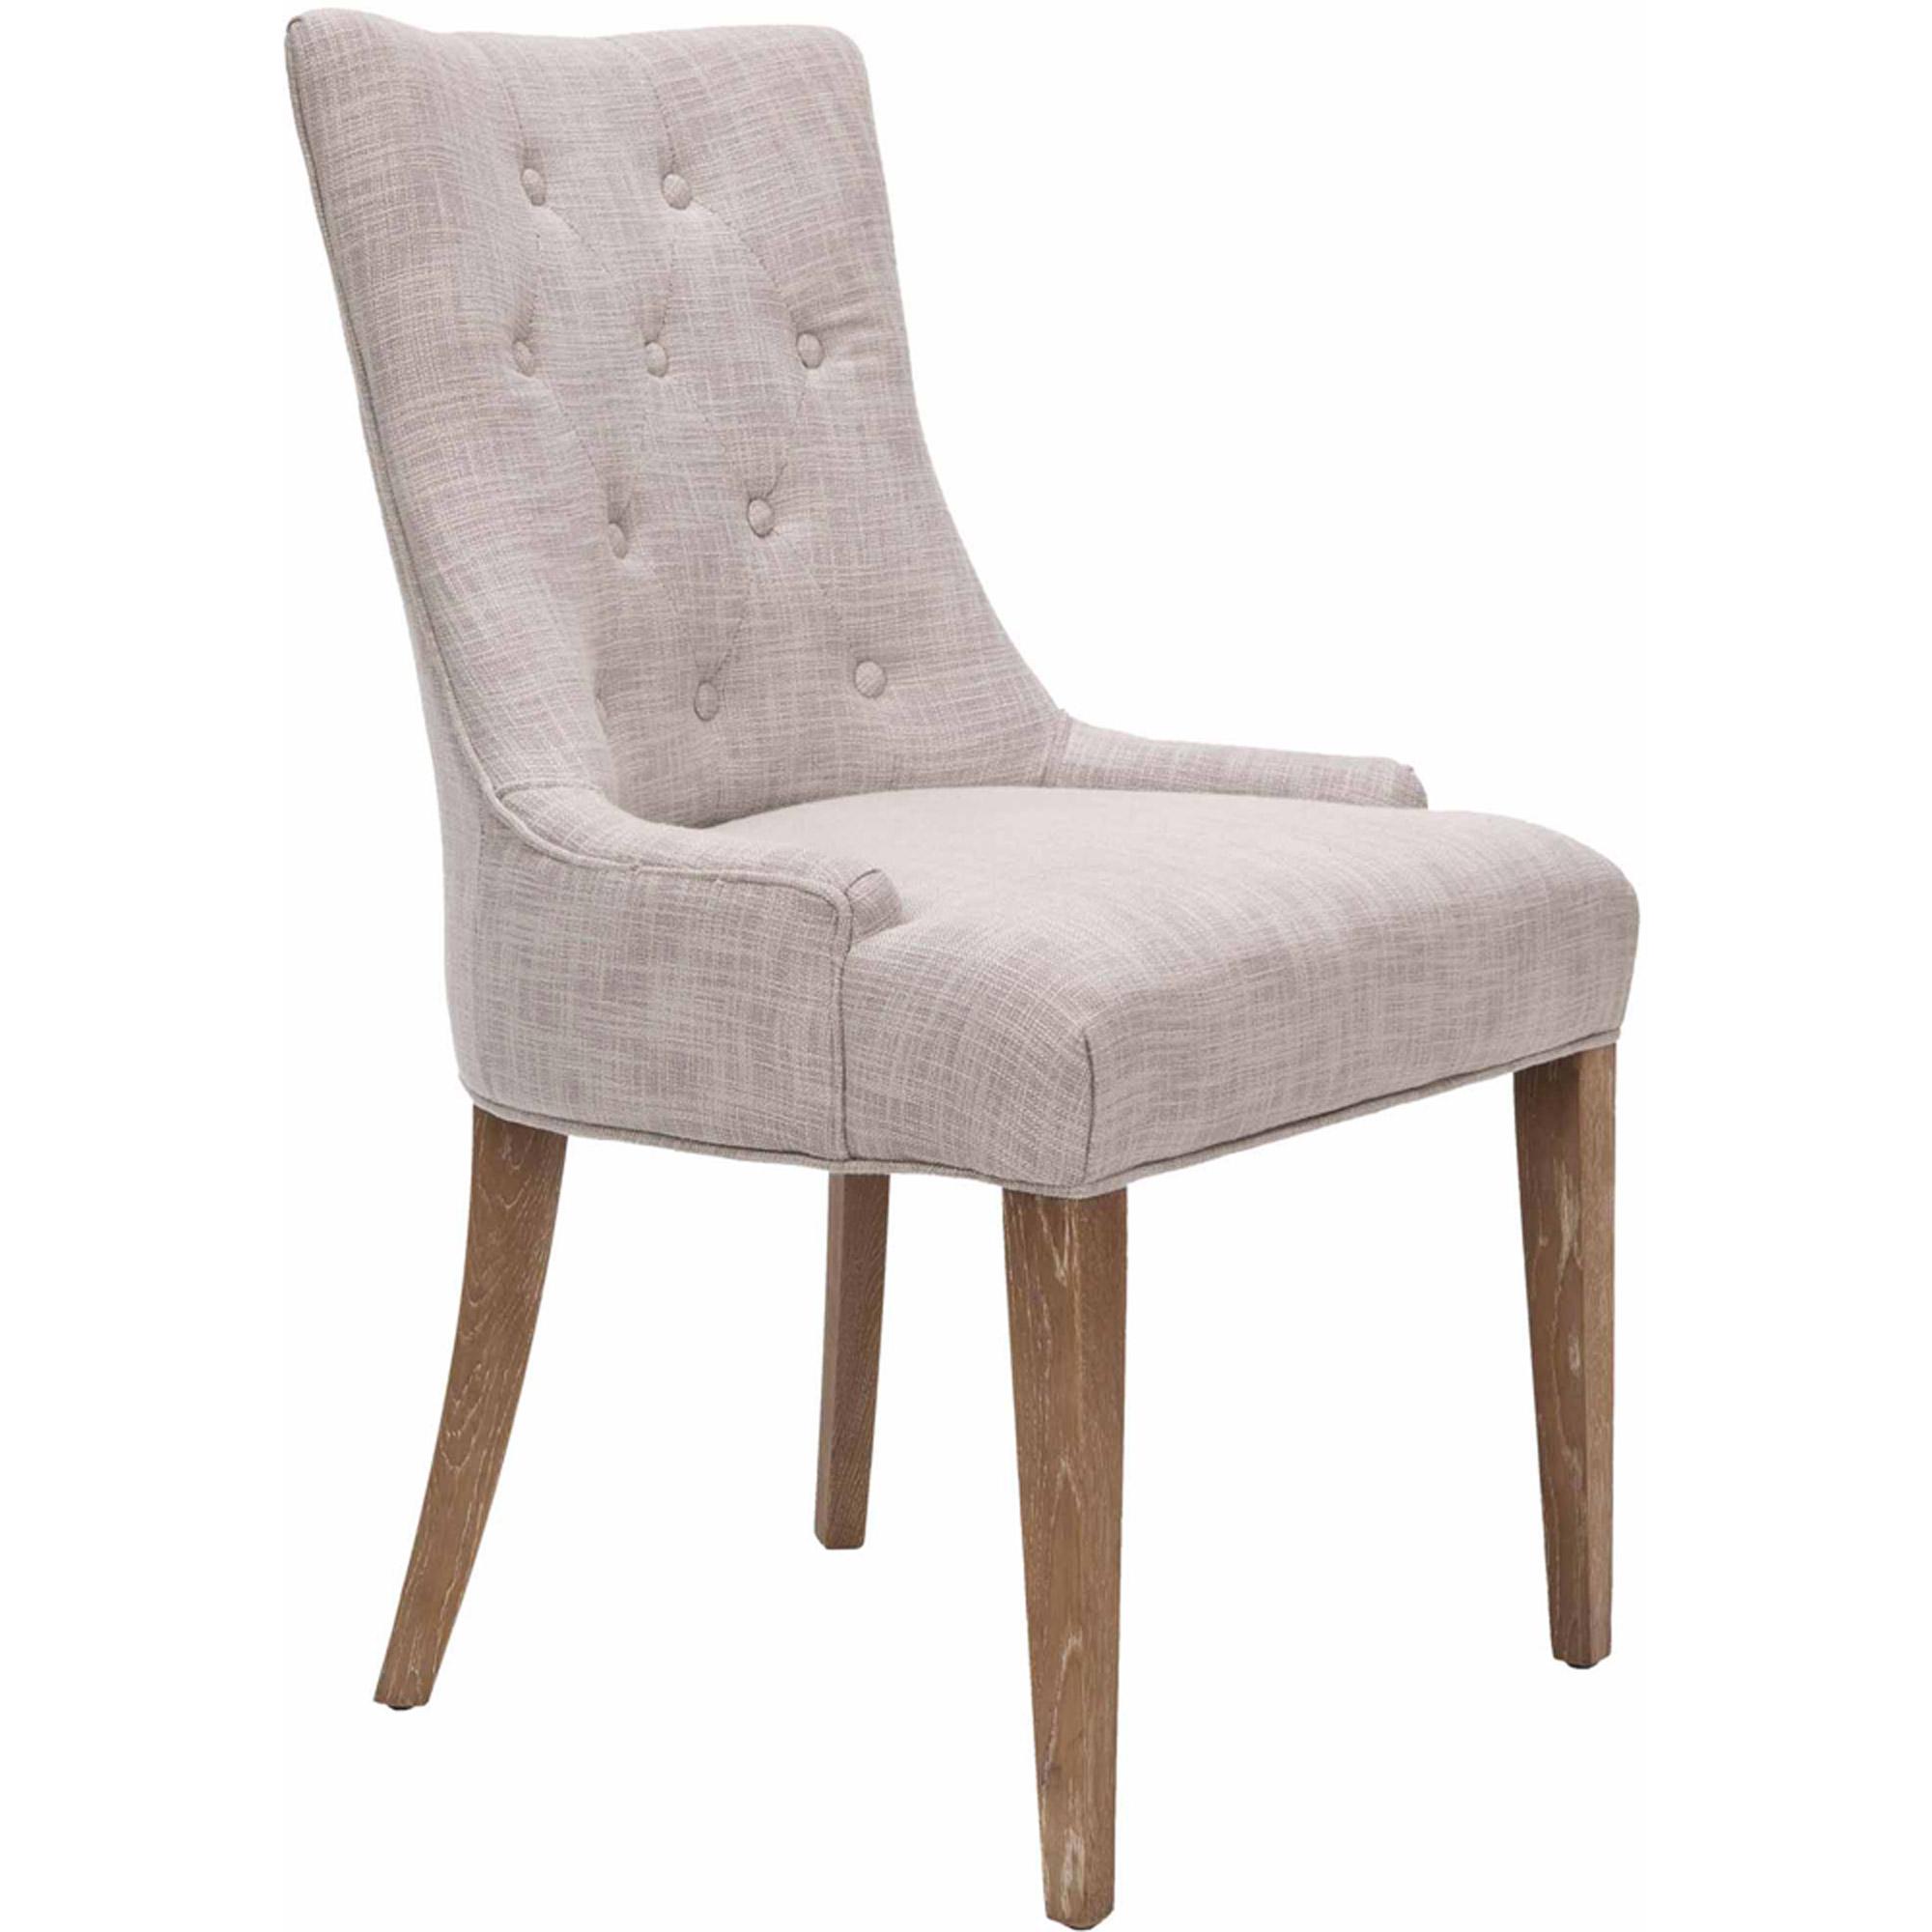 safavieh becca dining chair multiple colors  walmartcom -